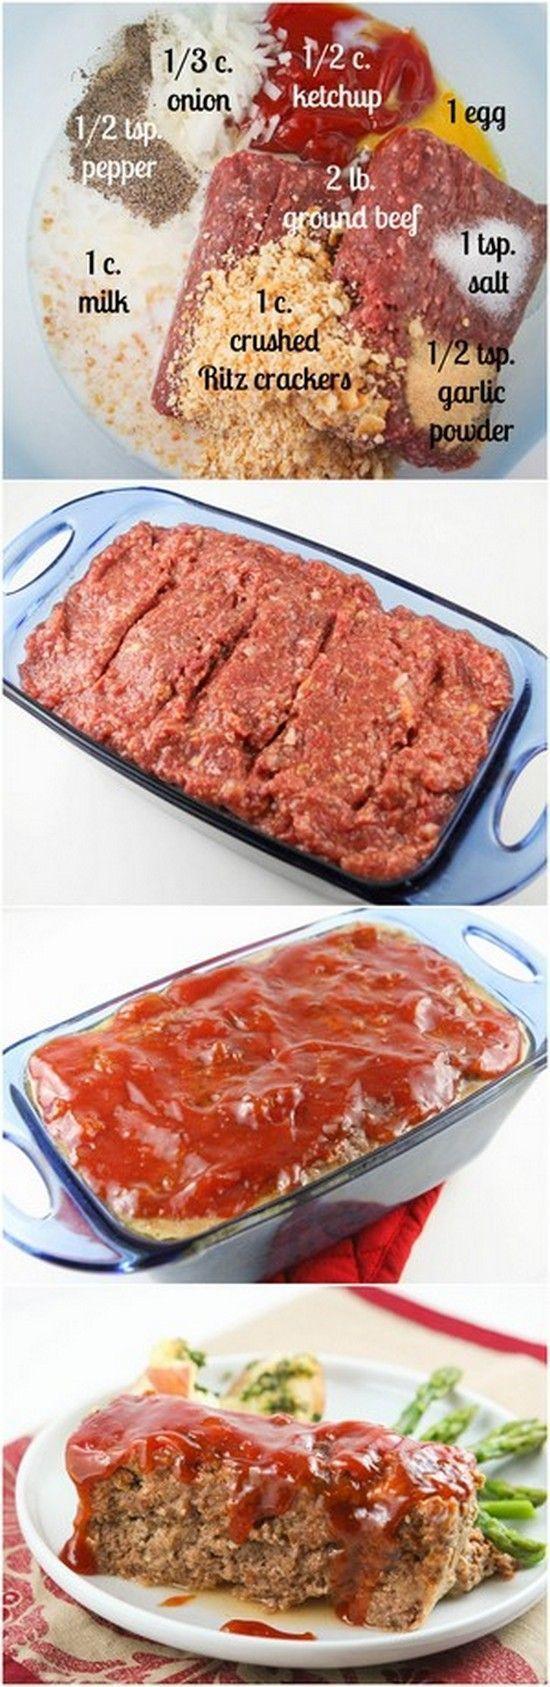 Best Ever Meatloaf Recipes Food Cooking